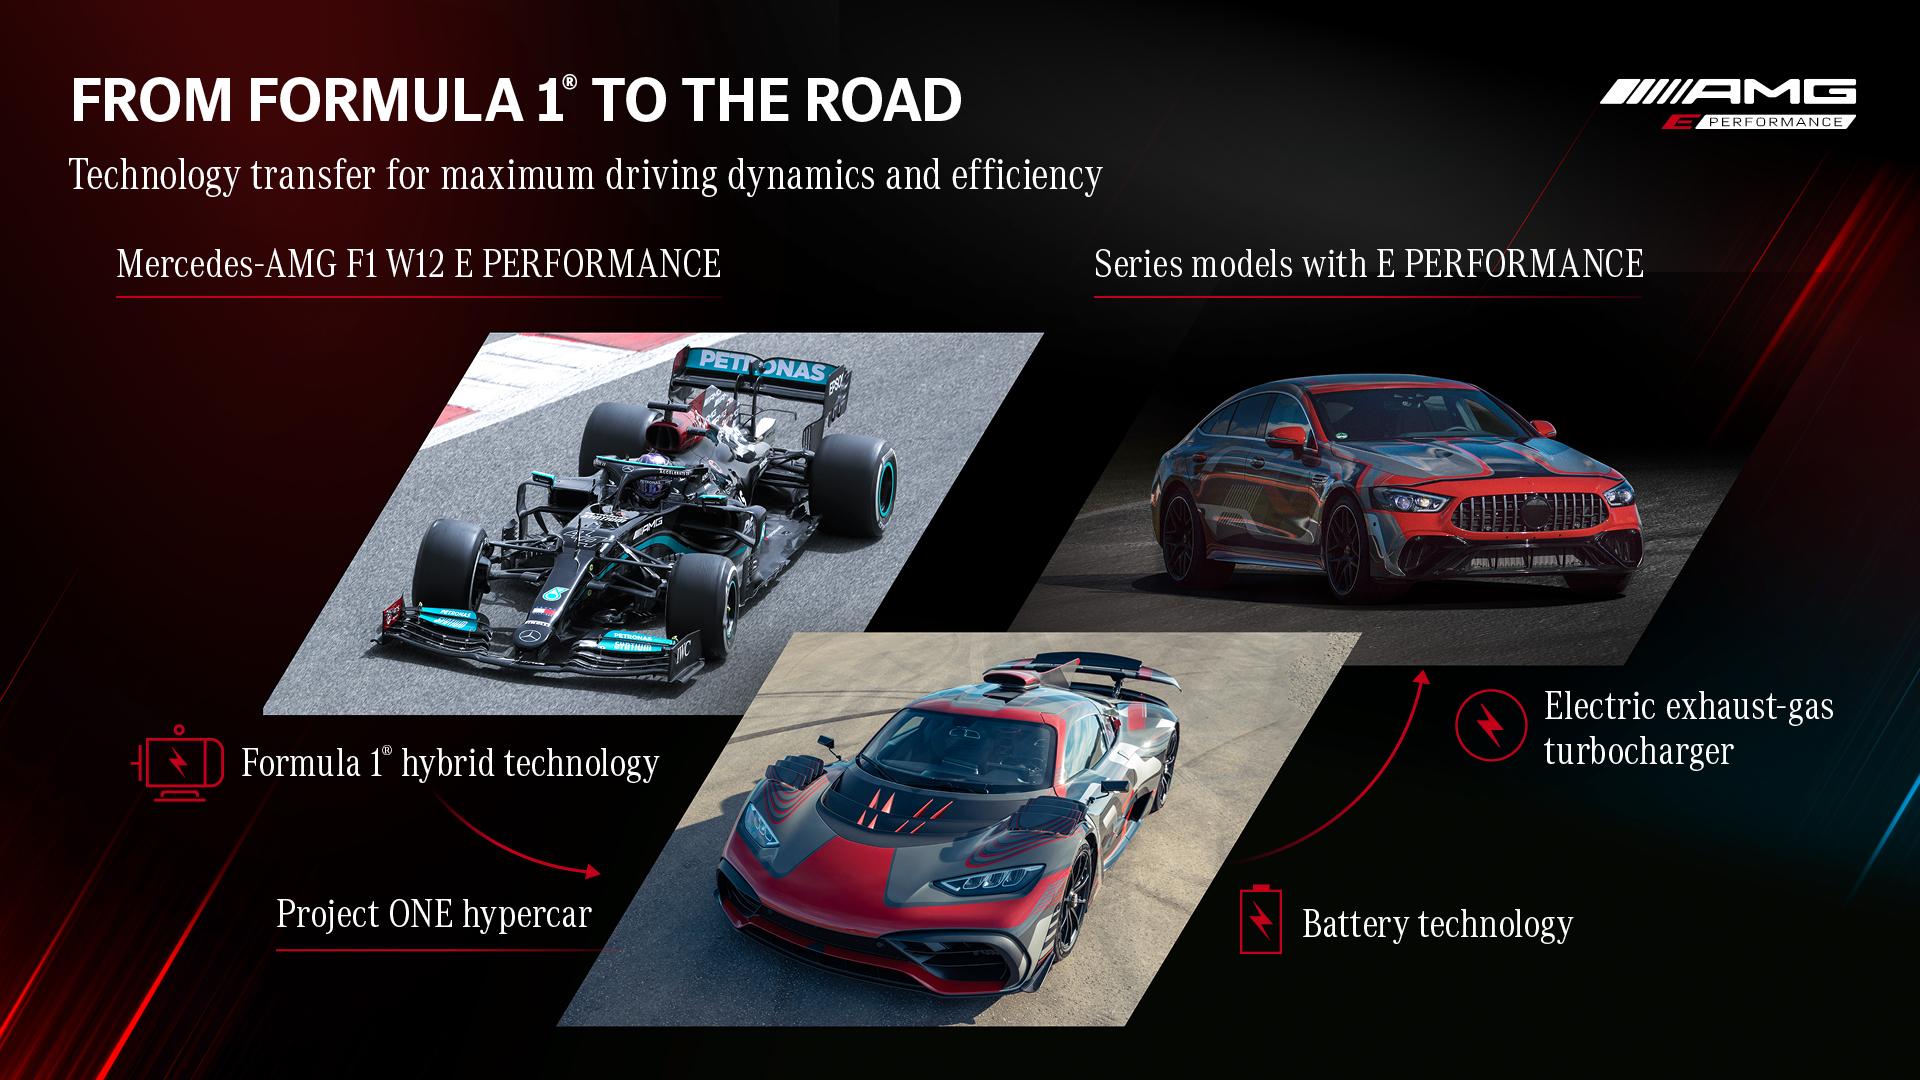 TecDAY AMG Future of Driving Performance Eigenständige E PERFORMANCE Antriebsstrategie für Performance-Hybride // TecDAY AMG Future of Driving PerformanceIndependent E PERFORMANCE drivetrain strategy for performance hybrids